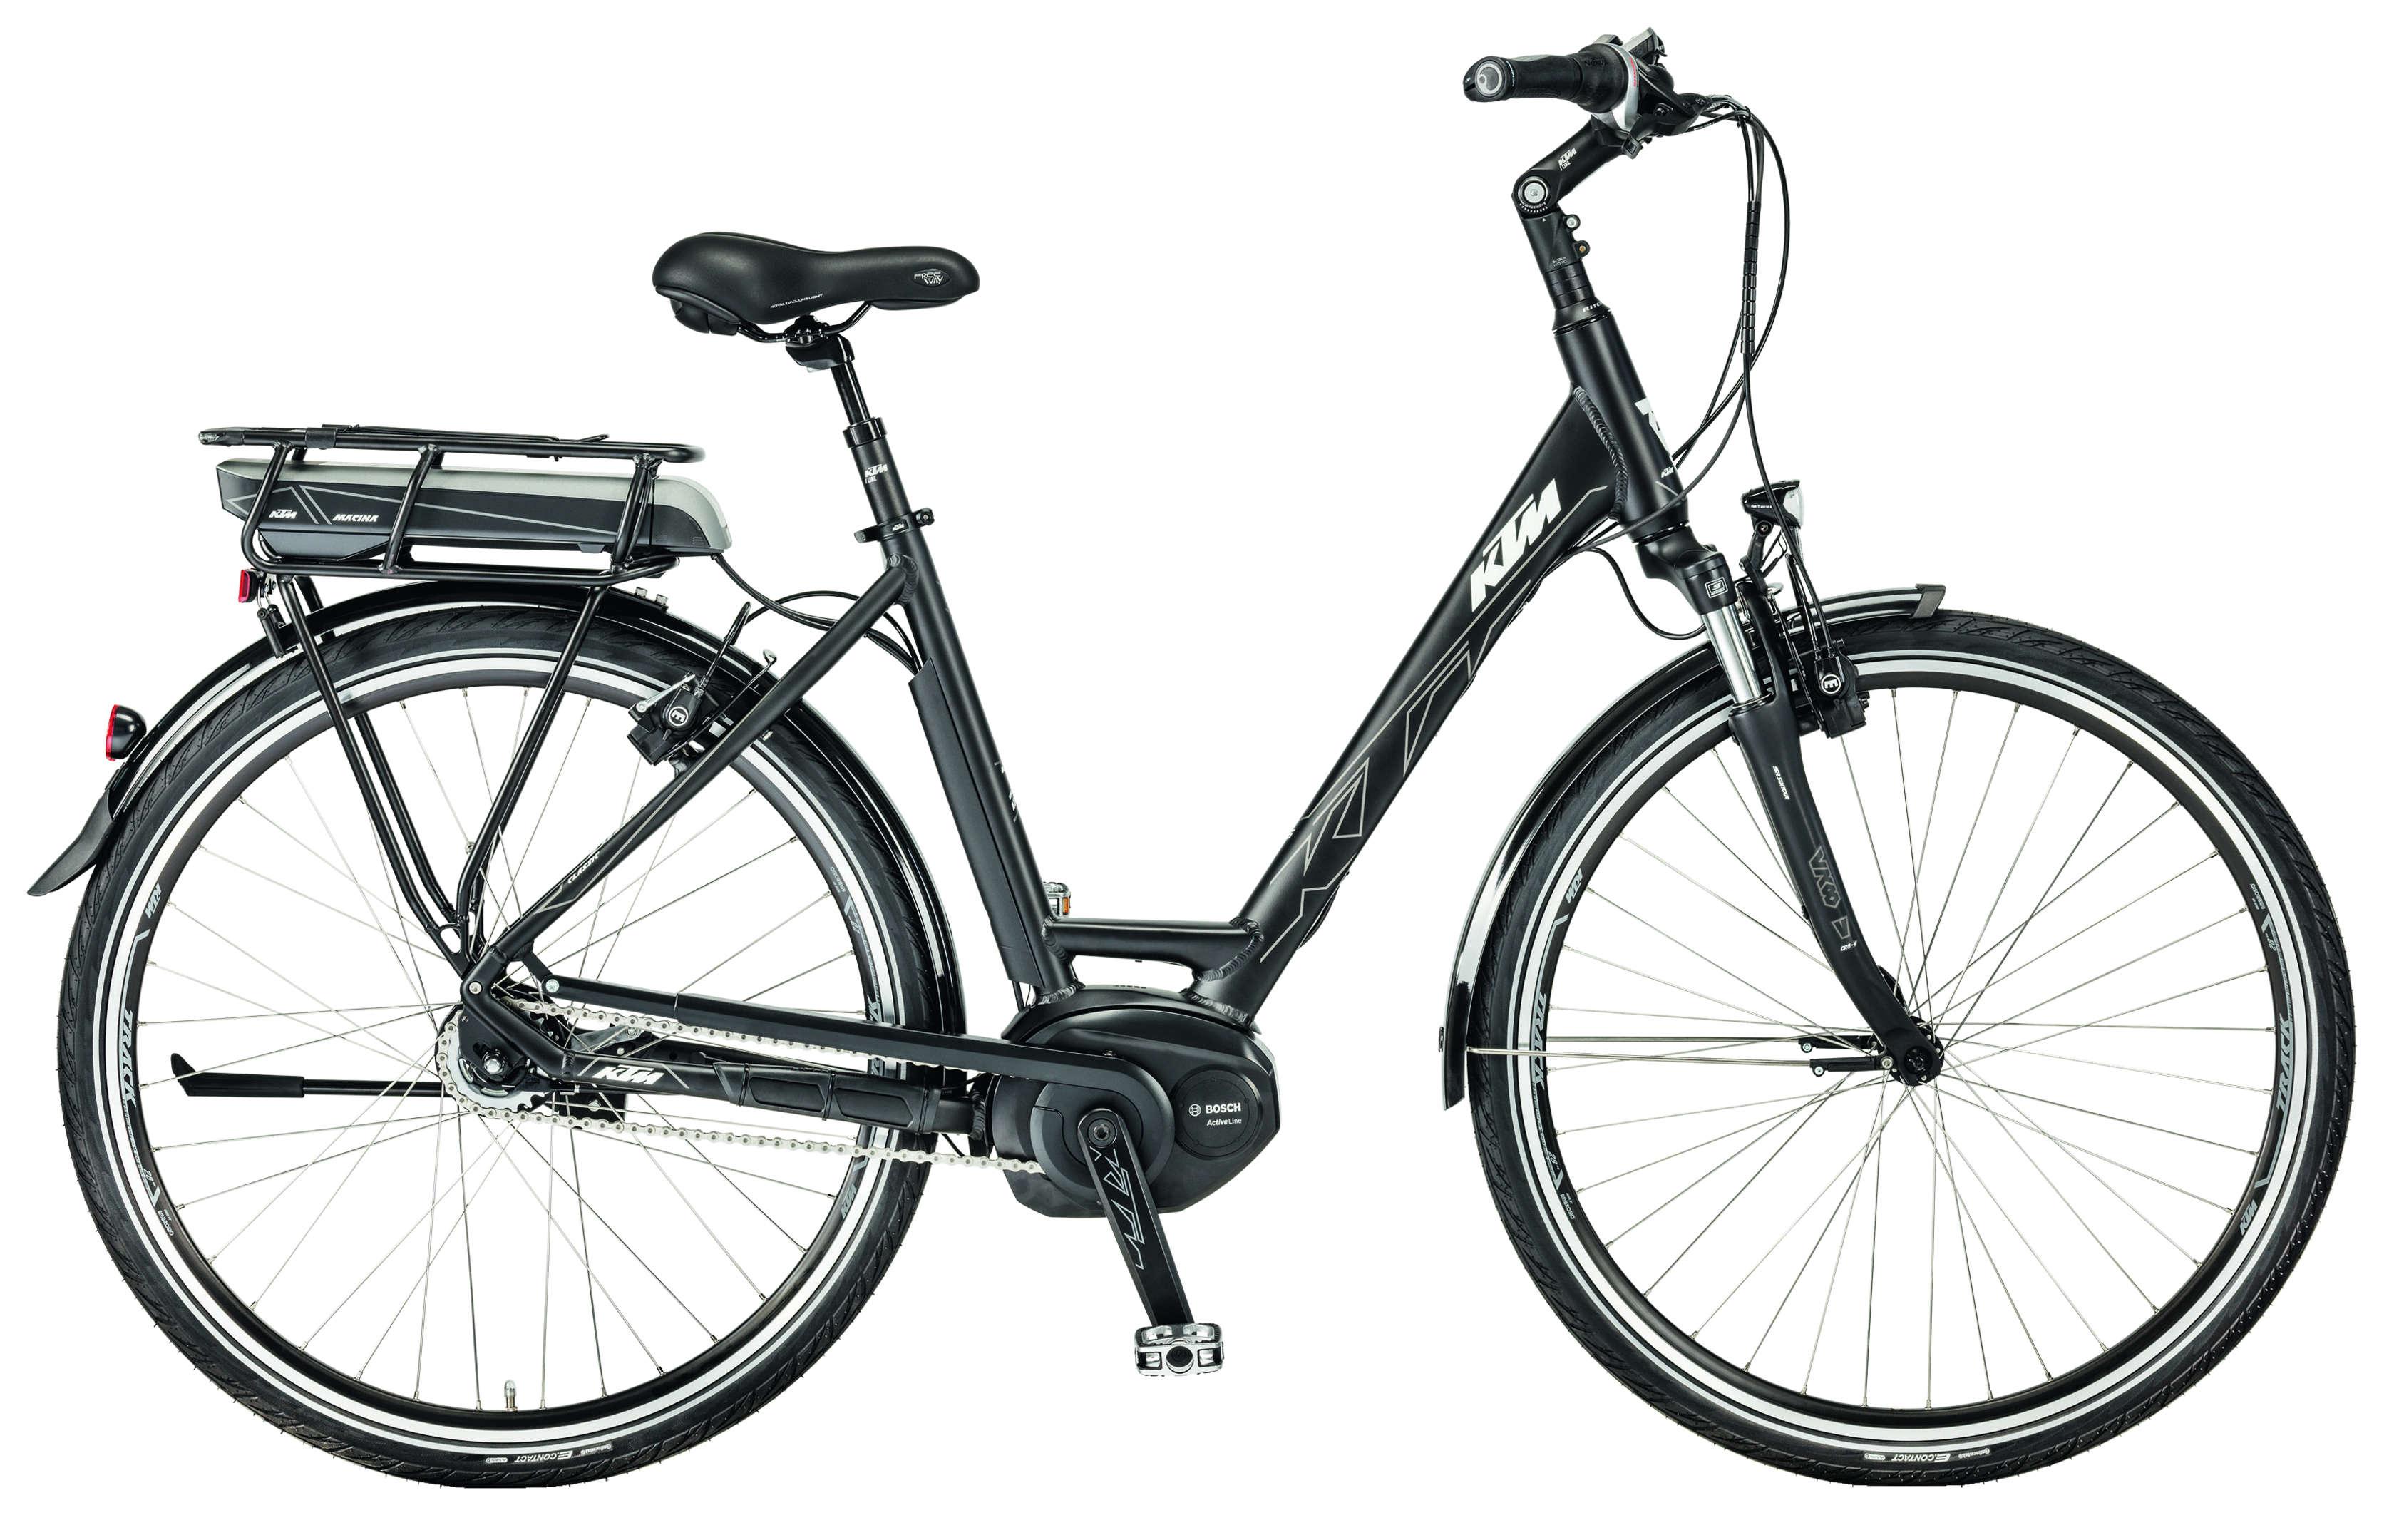 ktm e bike macina classic 8 rt a5 eurorad bikeleasingeurorad bikeleasing. Black Bedroom Furniture Sets. Home Design Ideas